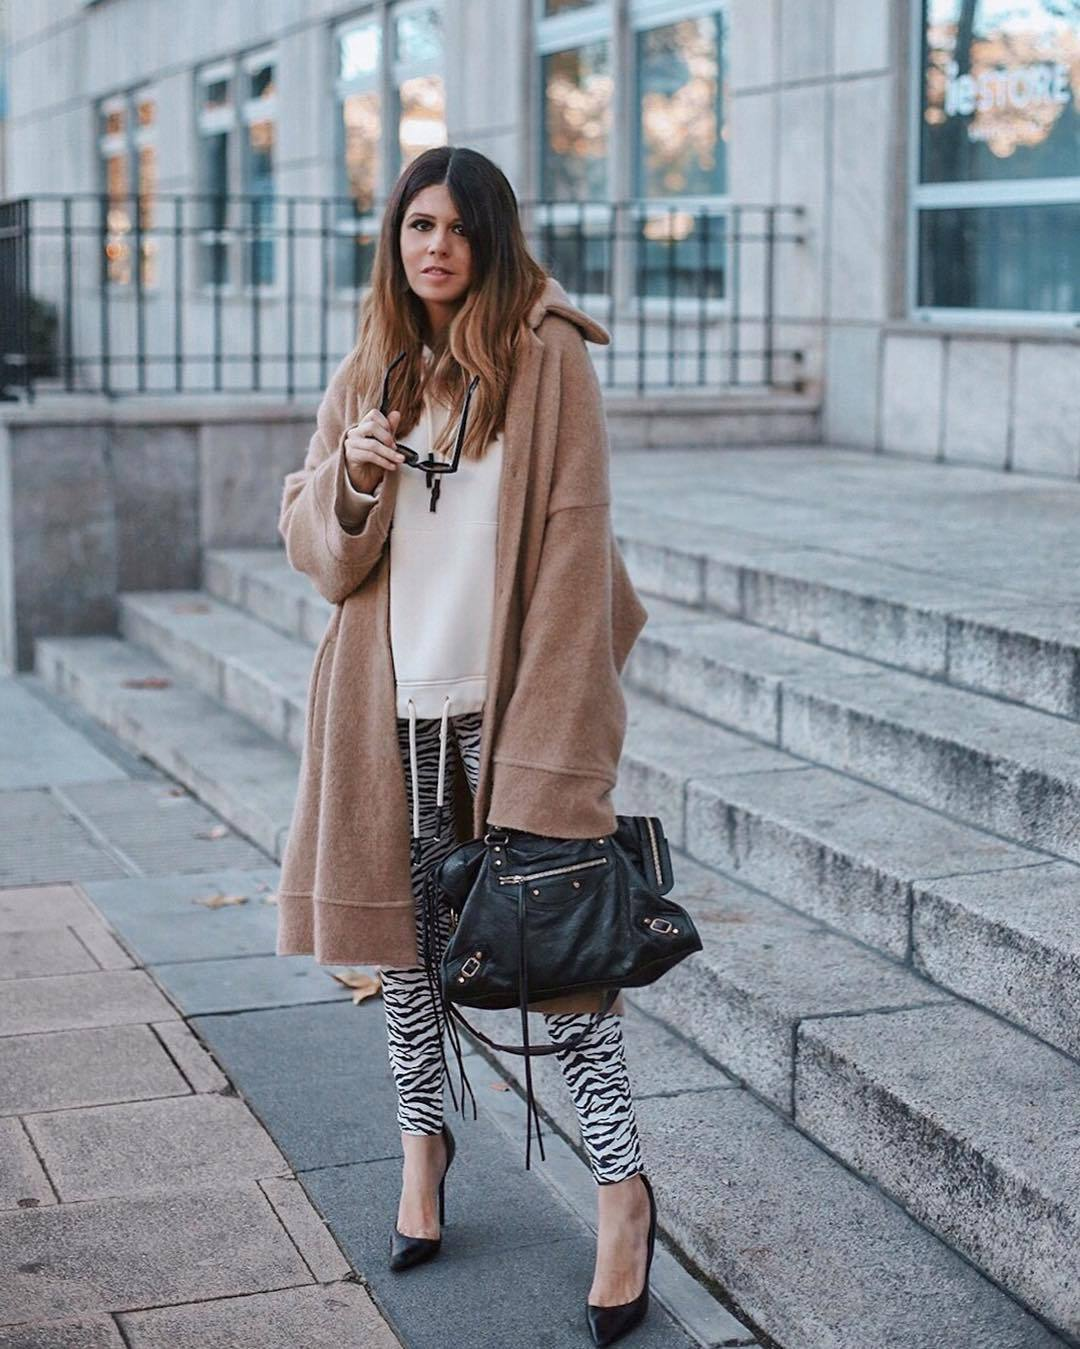 pants skinny pants zebra pumps black bag shoulder bag camel coat hoodie